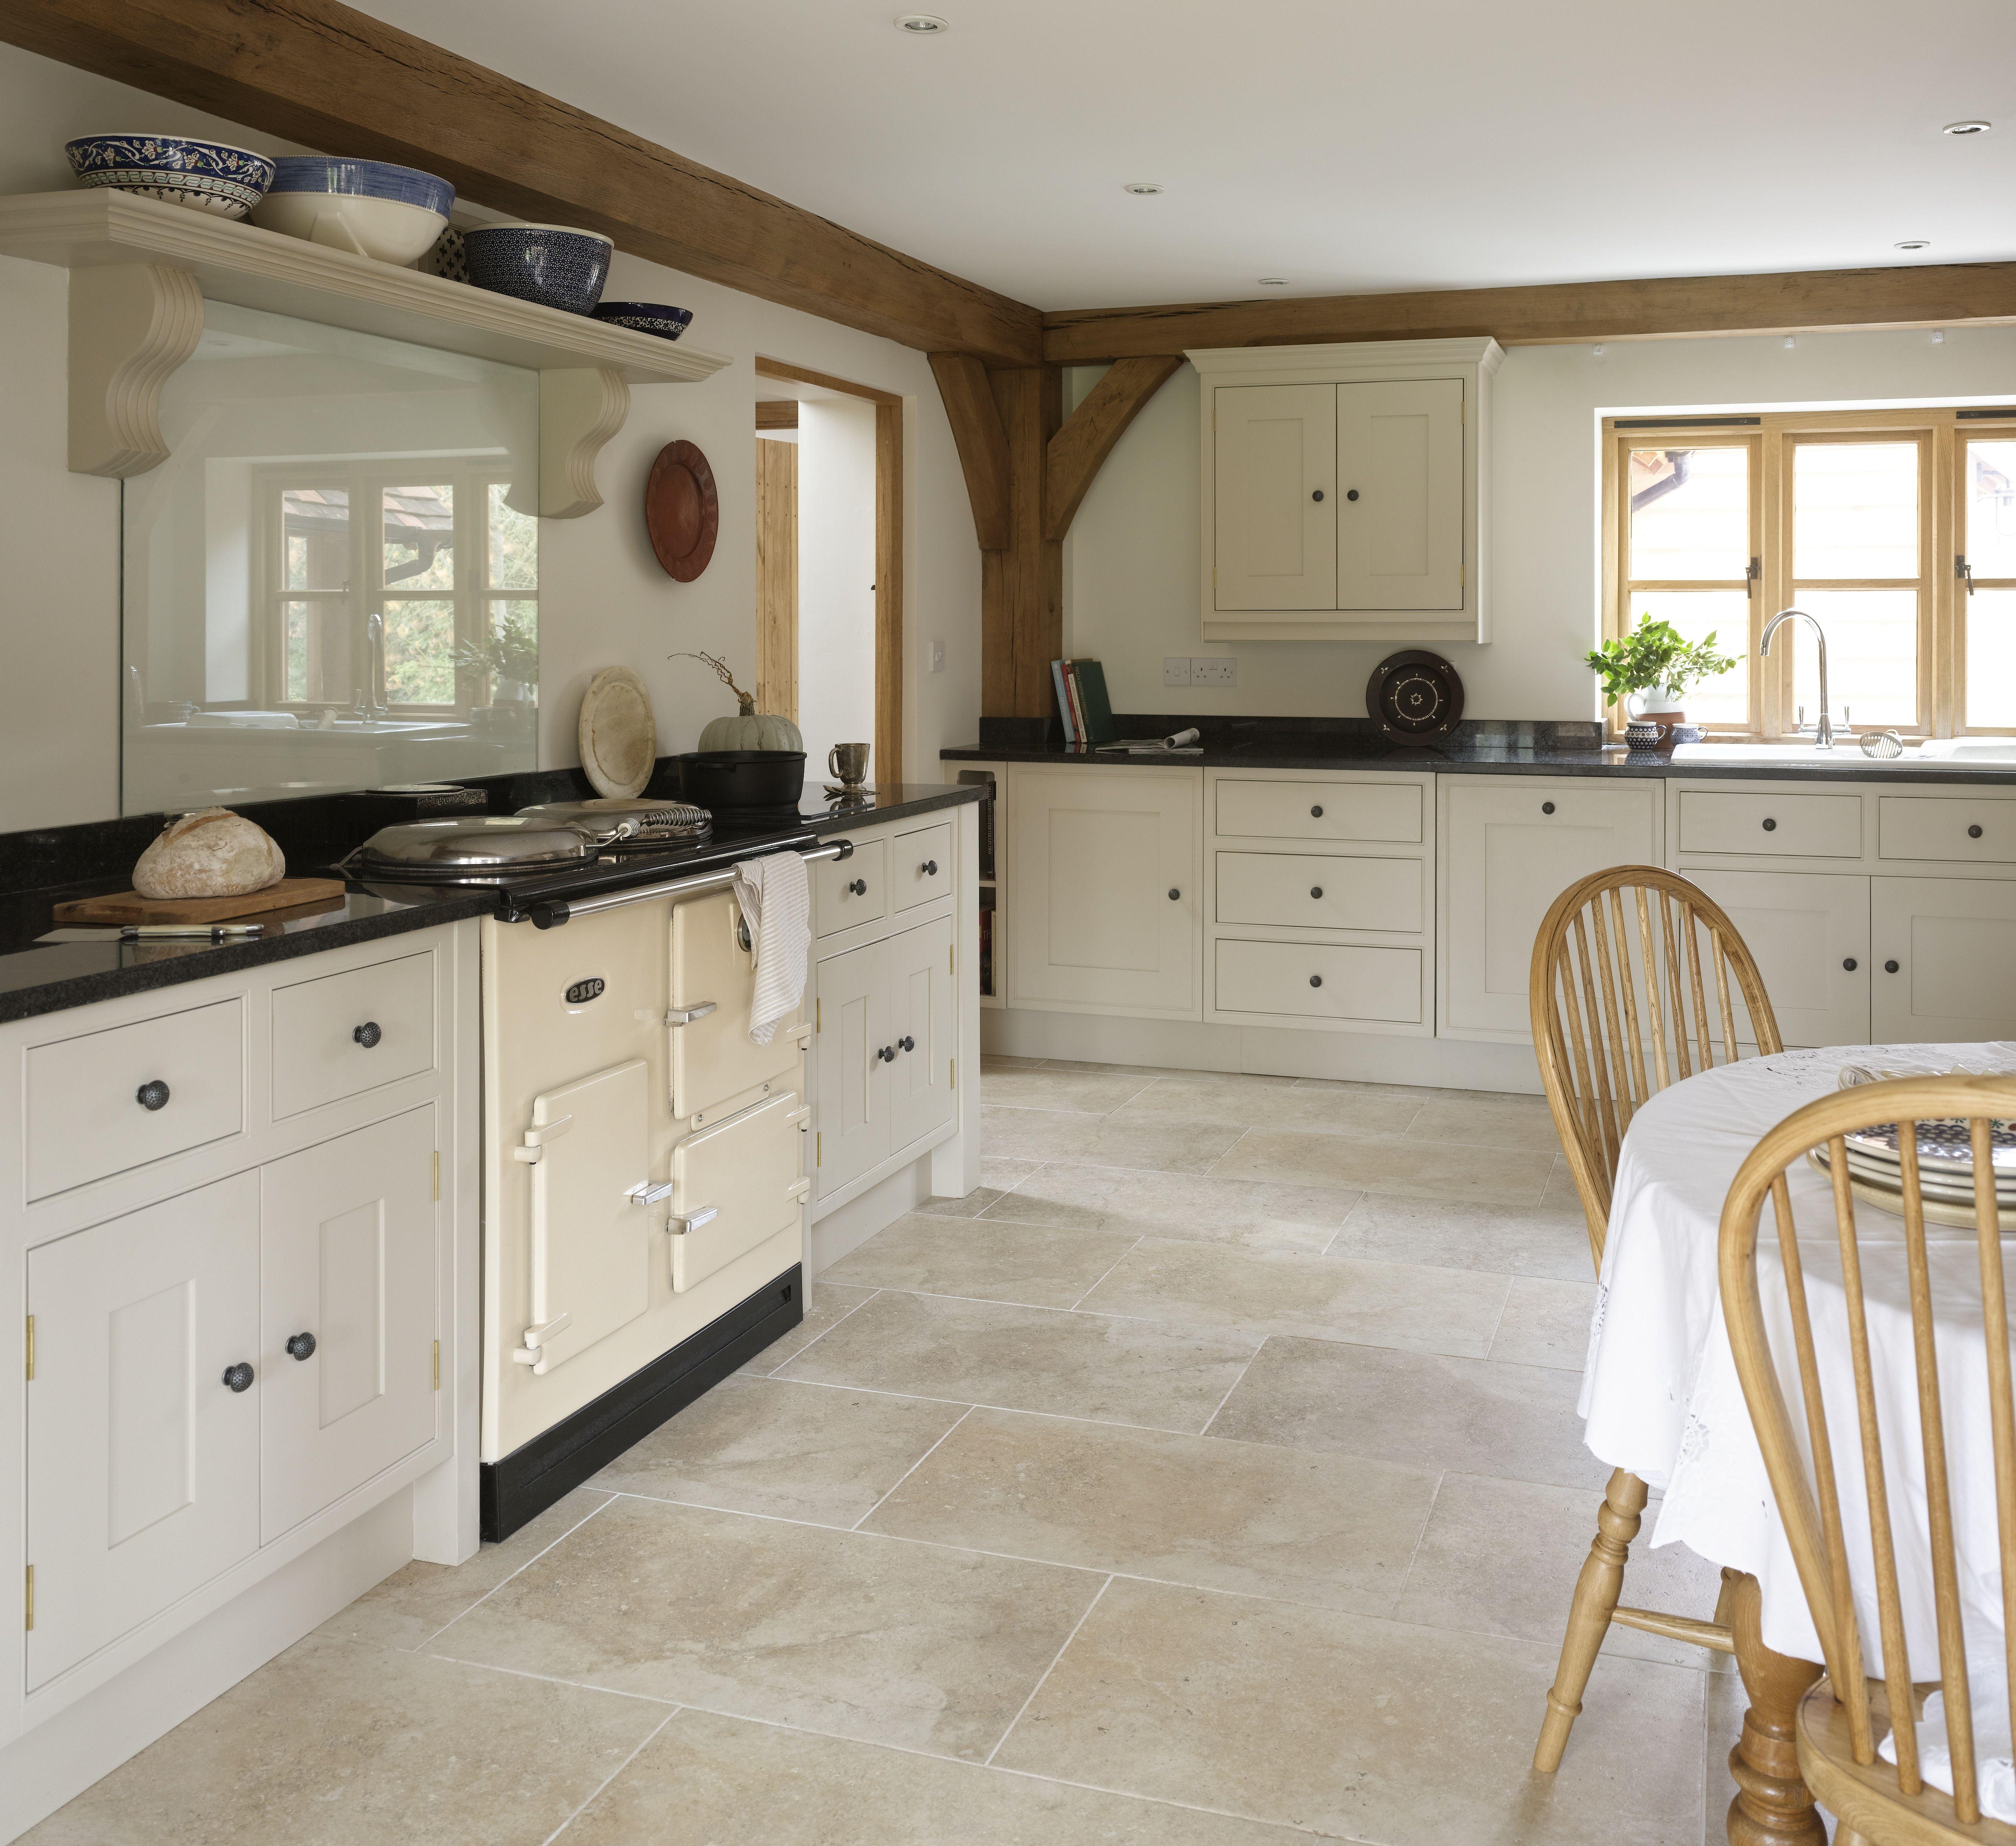 Flooring For Kitchen: Pin By Luke Turner On Kitchen